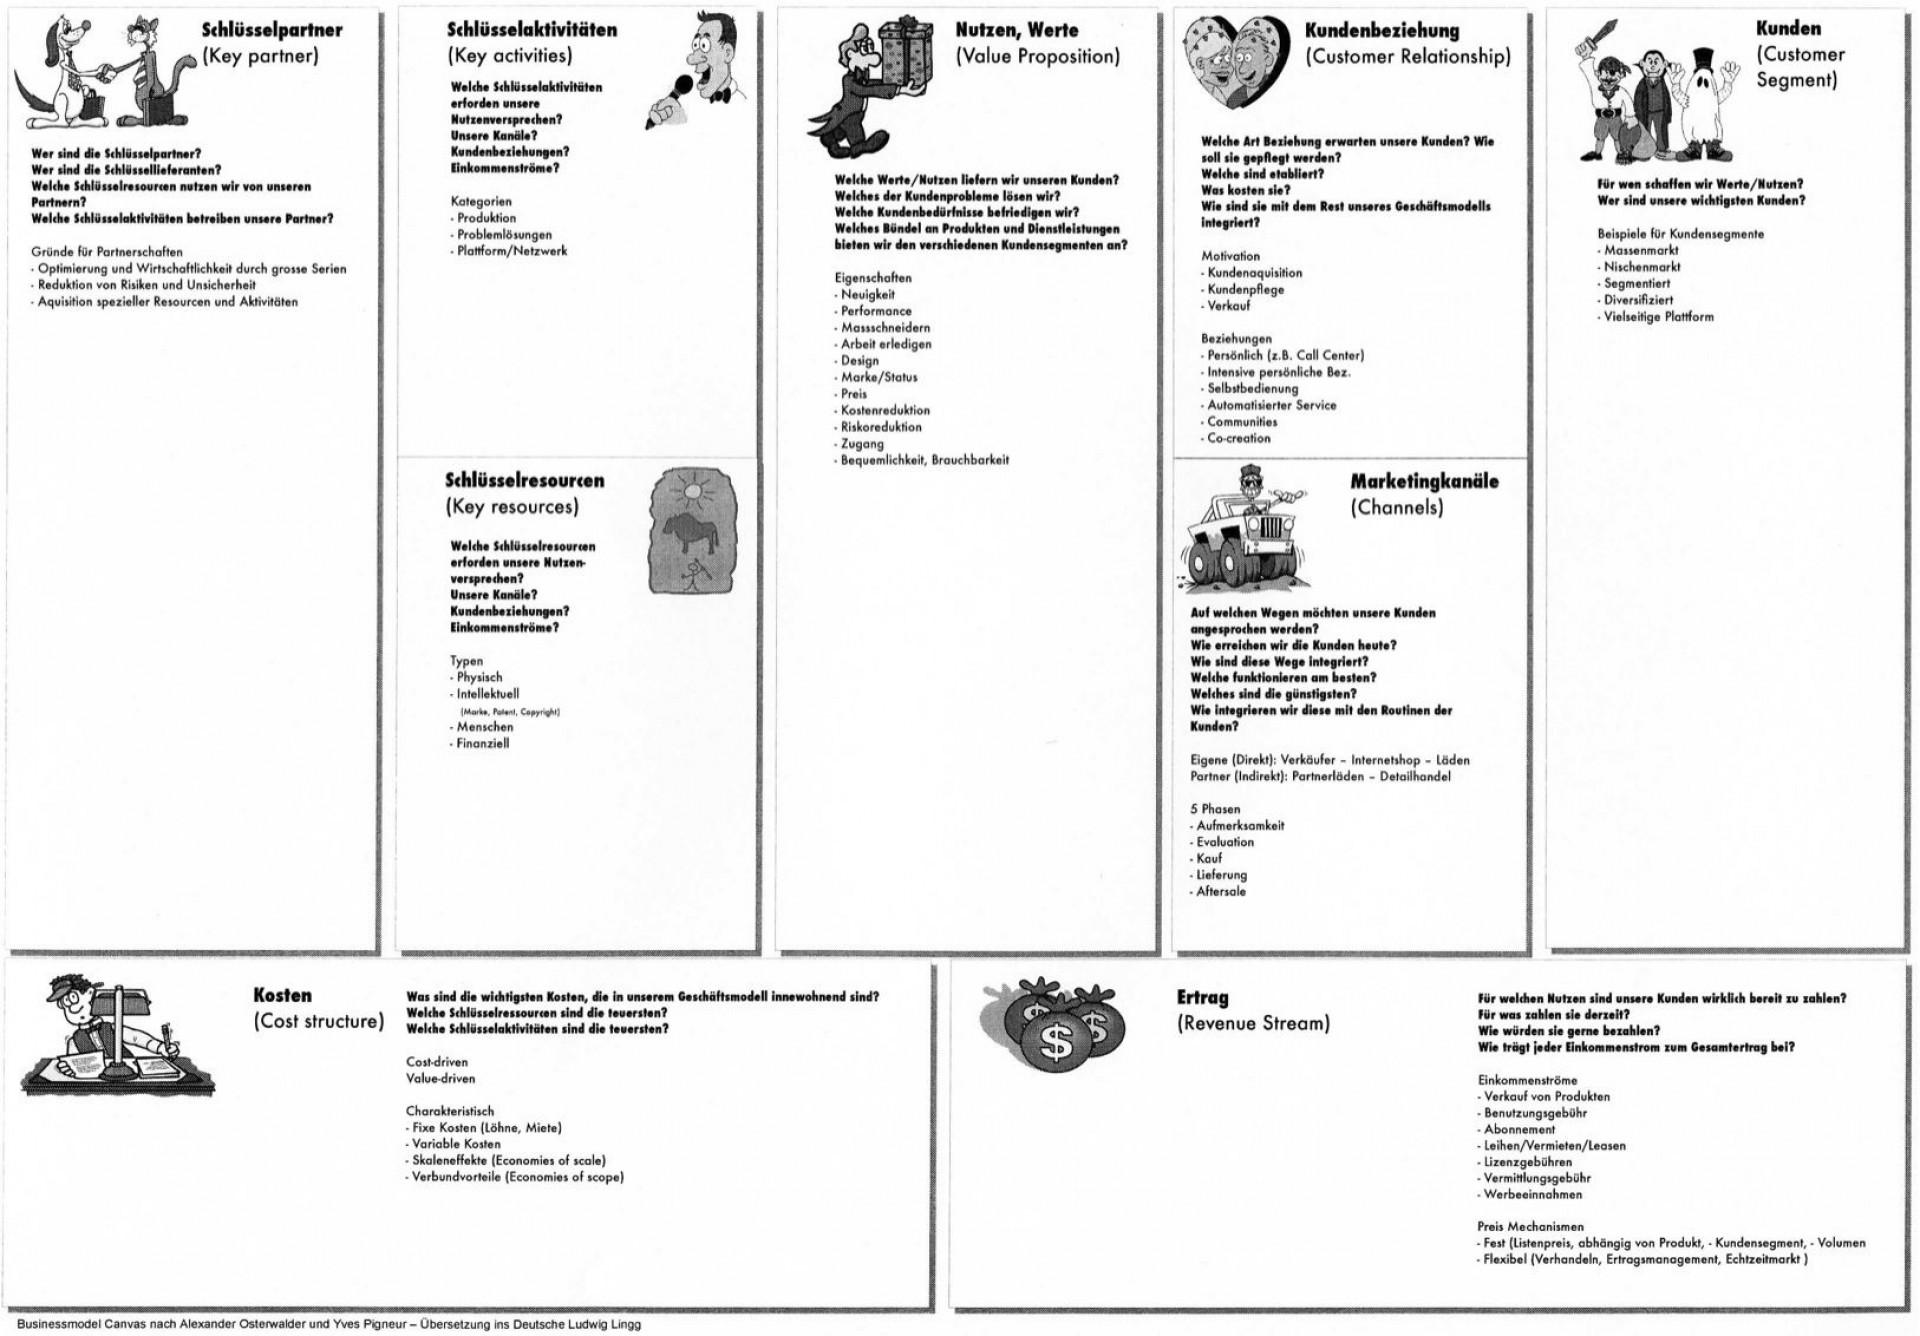 009 Stirring Busines Model Canva Template Excel Deutsch Example 1920